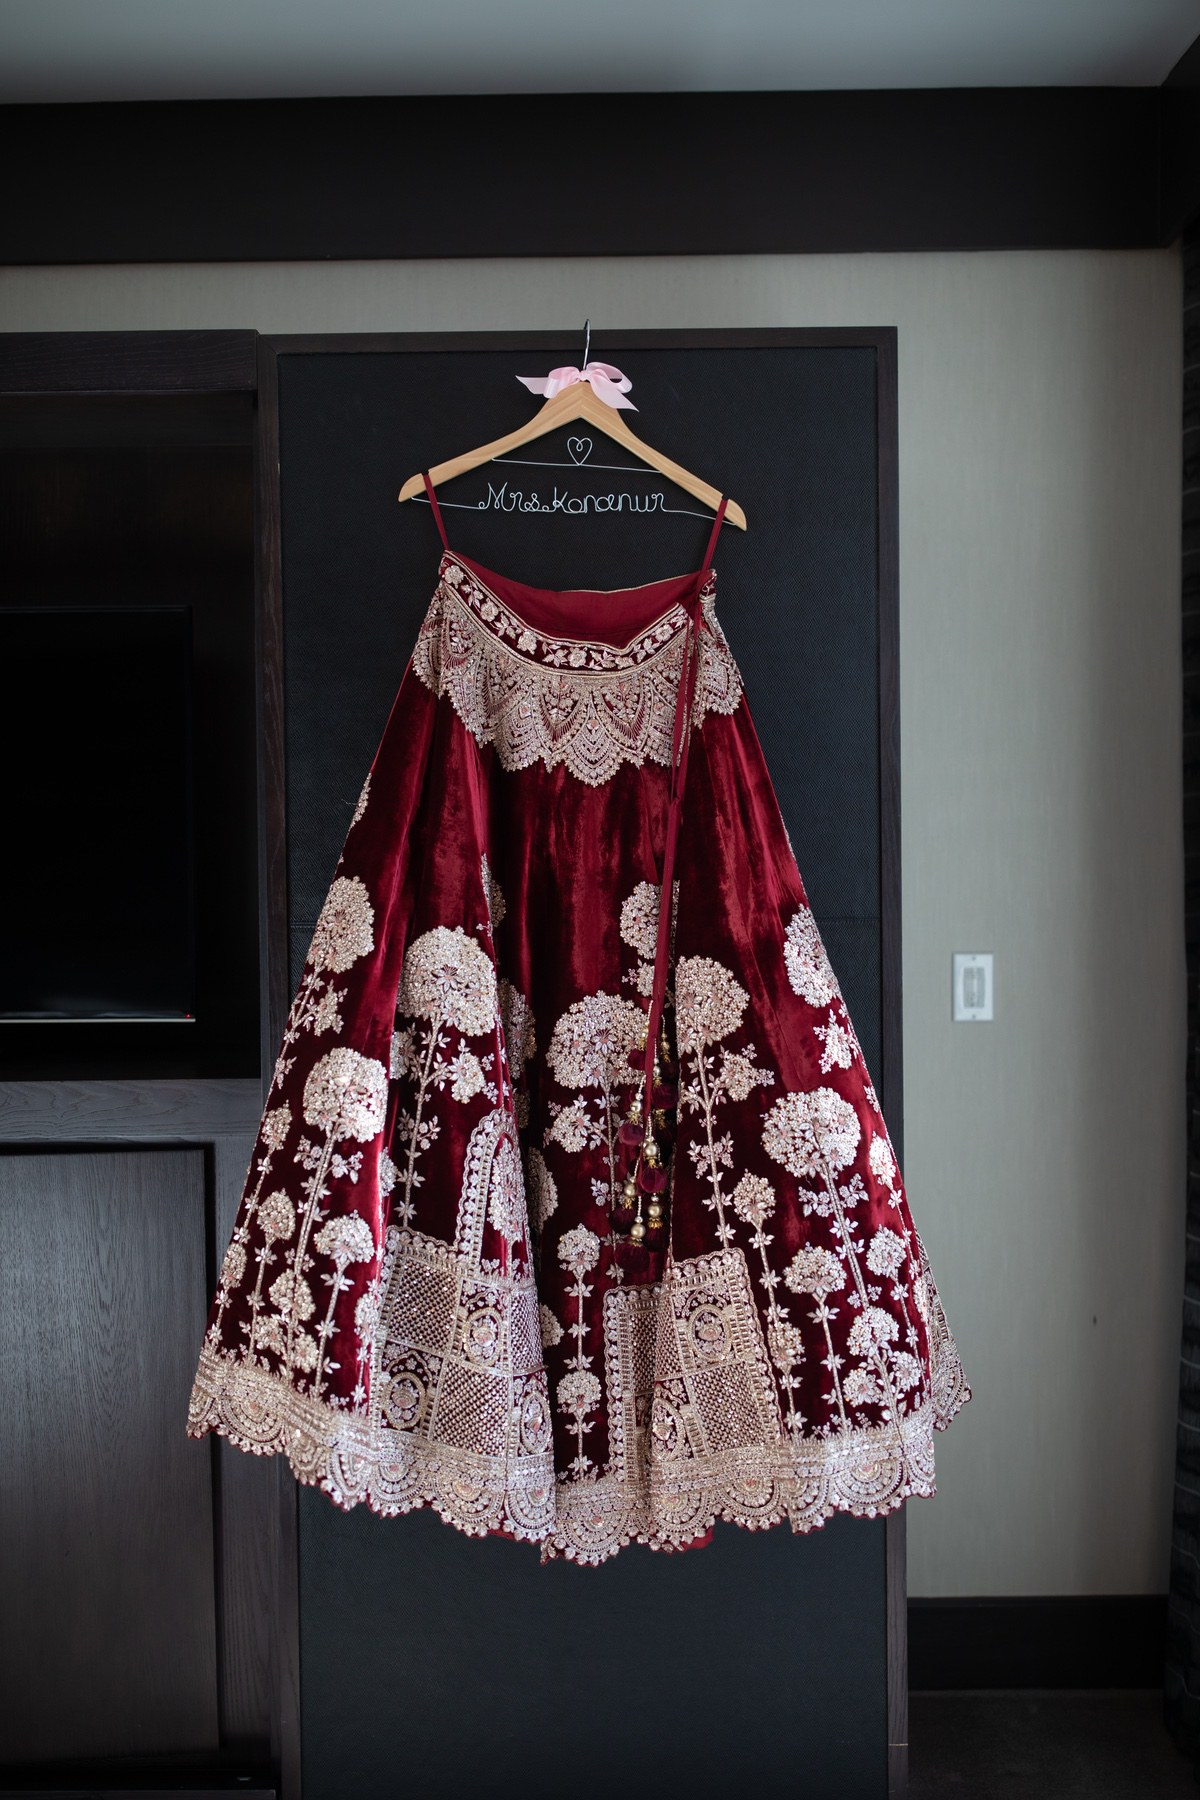 Le_Cape_Weddings_-_Serena_and_Kylash_-_Chicago_South_Asian_Wedding_-_Bride_Getting_Ready-5.jpg